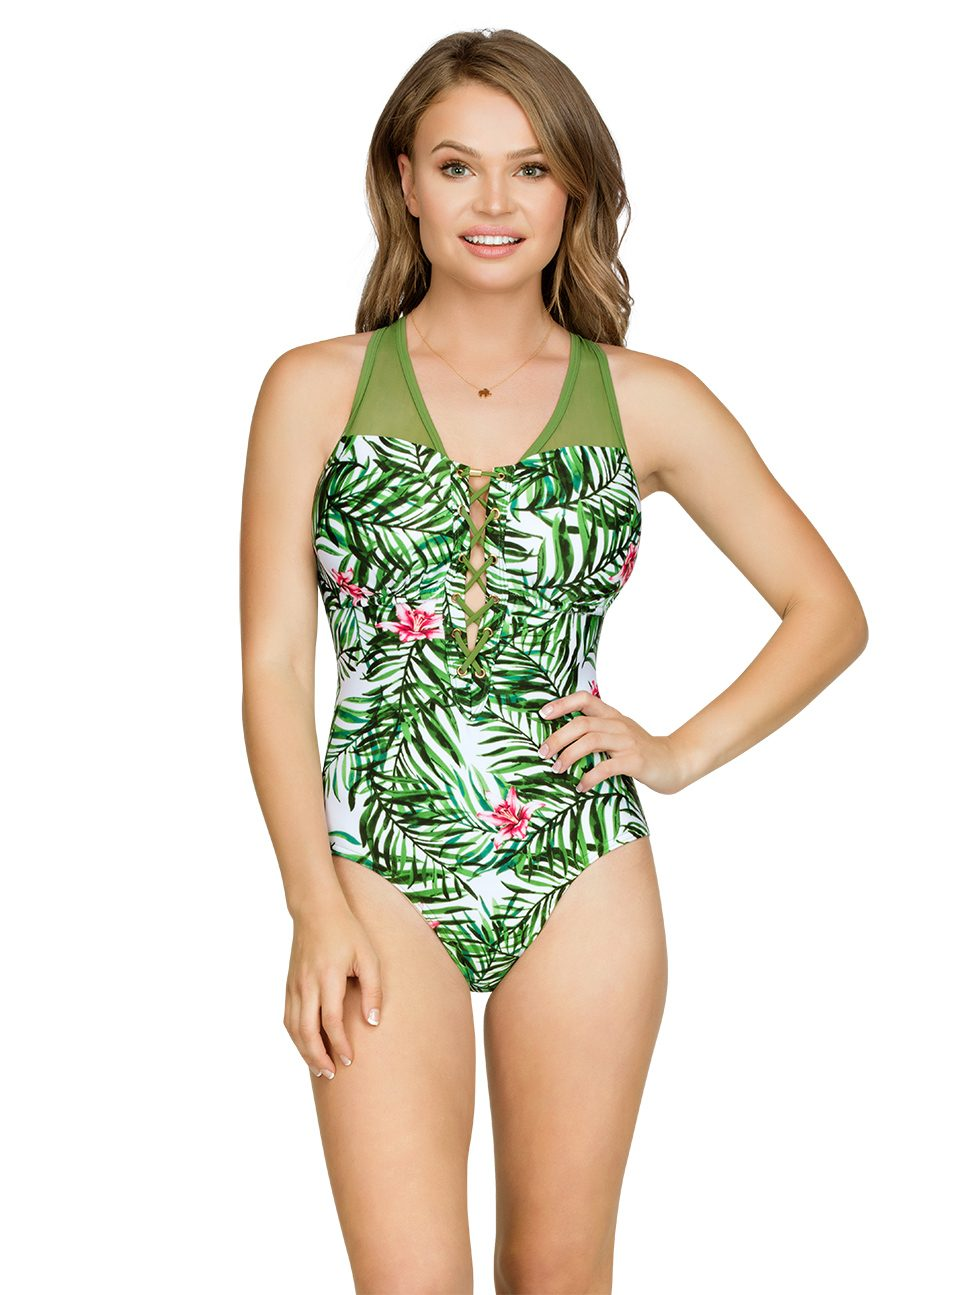 MODBYPARFAIT_Passion_OnePieceSwimsuitS8106_TropicalPrint_Front1